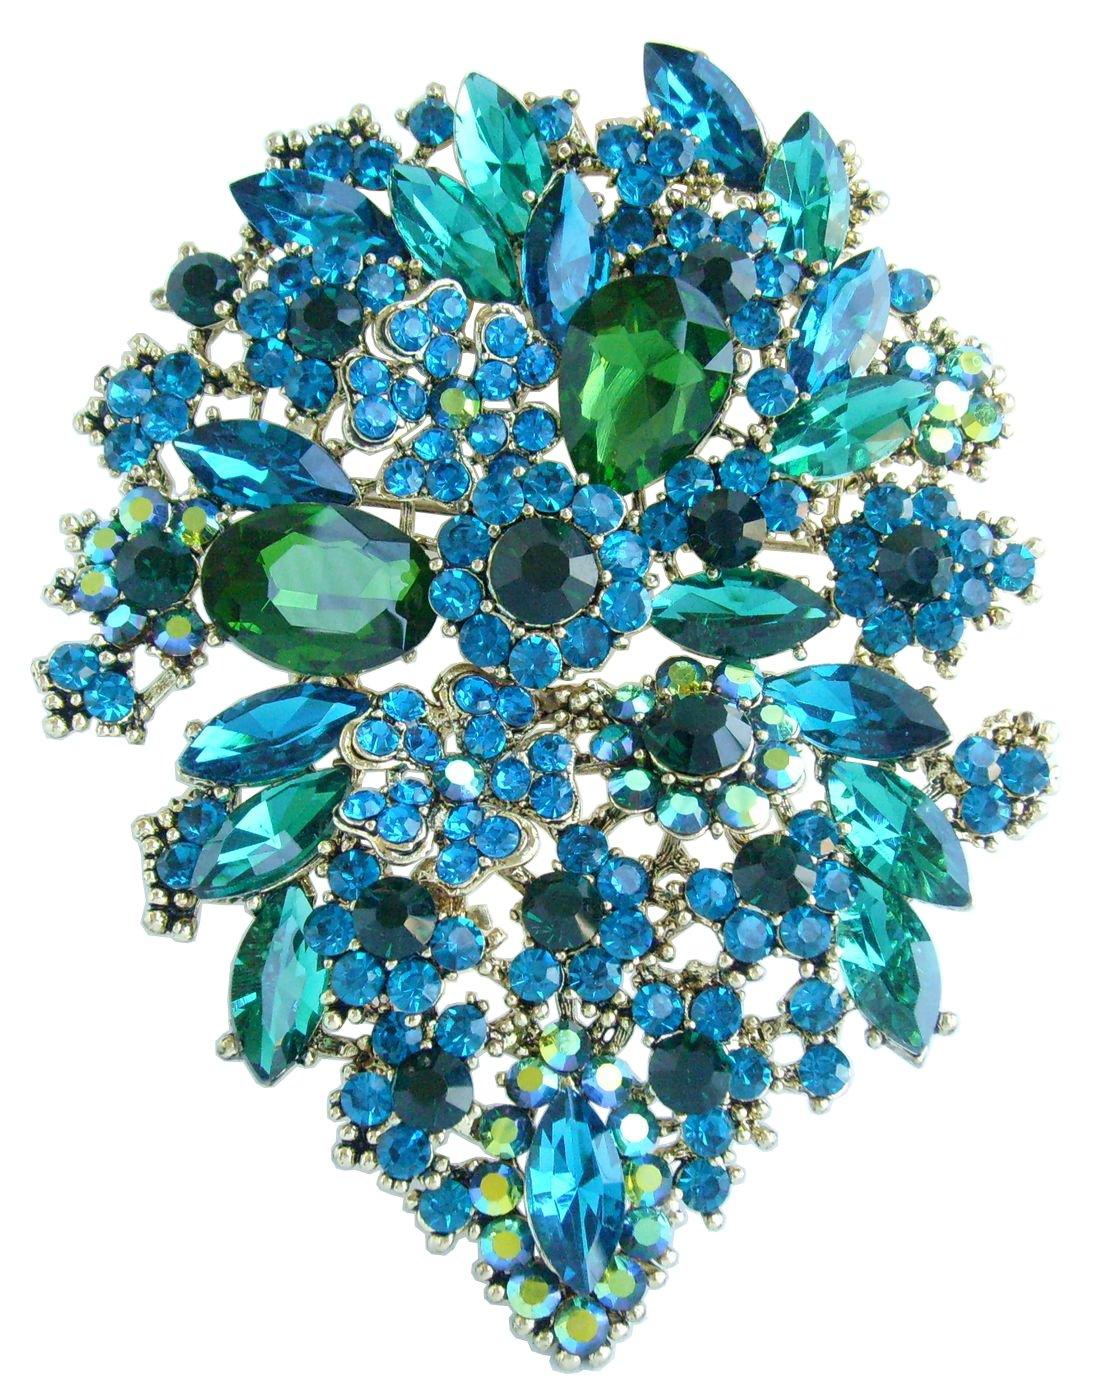 Sindary 4.13'' Rhinestone Crystal Flower Brooch Pin Pendant Wedding Bouquet BZ3905 (Gold-Tone Green)